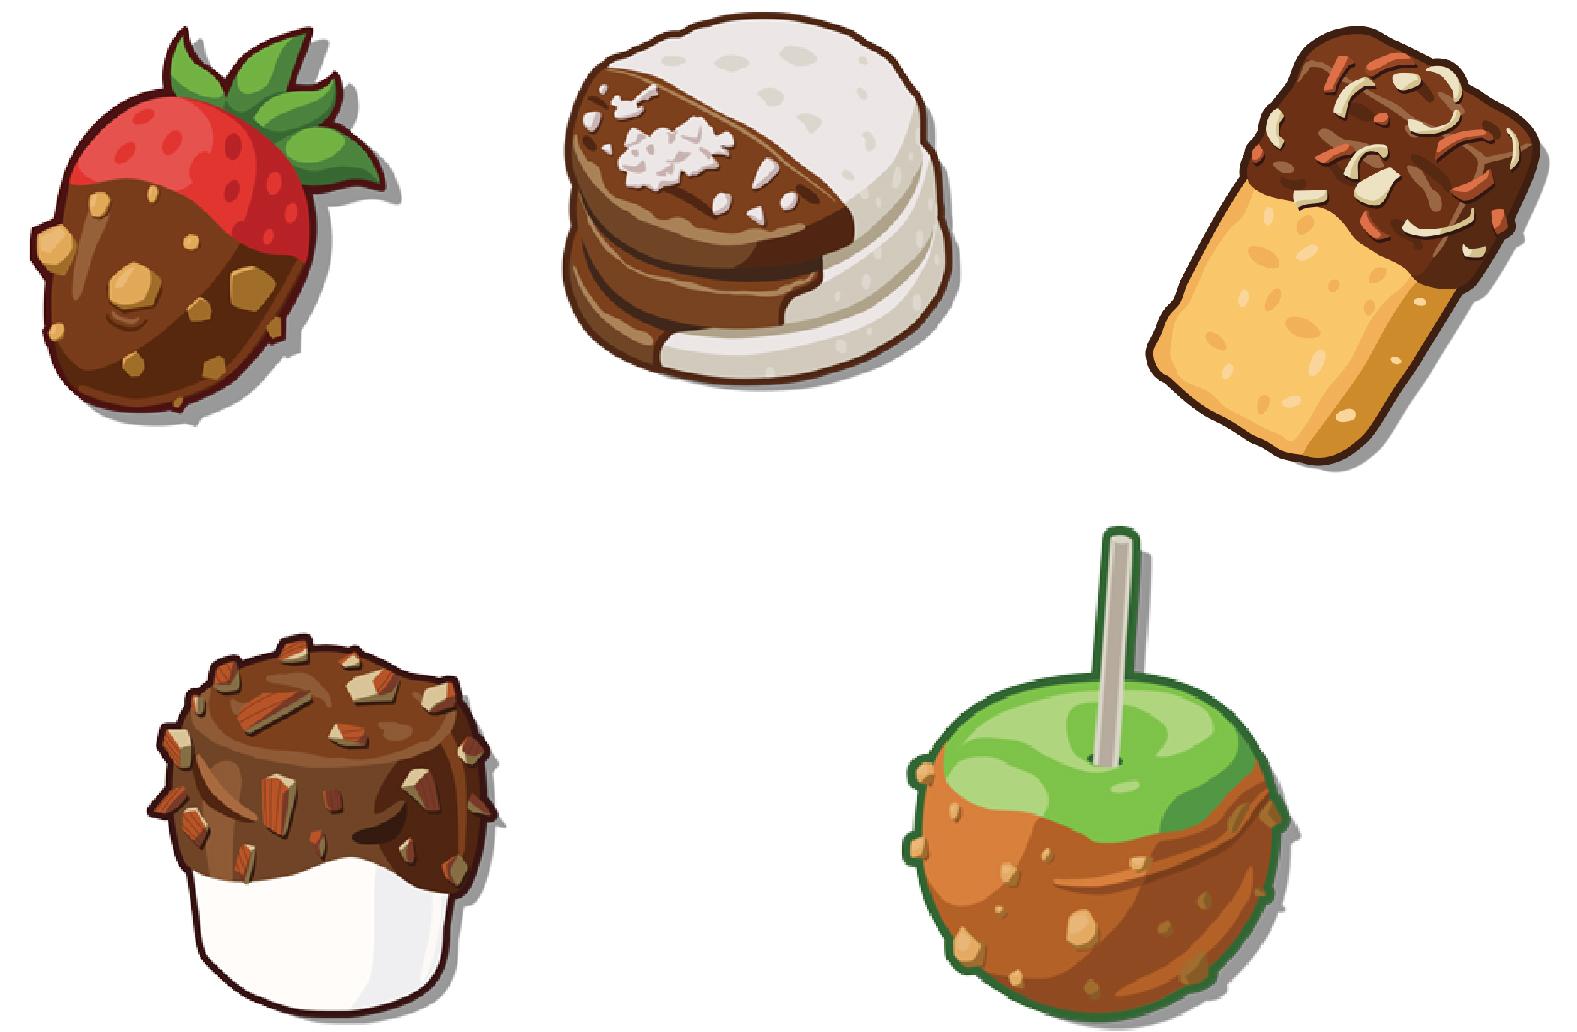 Icon Design for Forever Donut (N3twork Inc)  Figure above: Made in Adobe Illustrator.